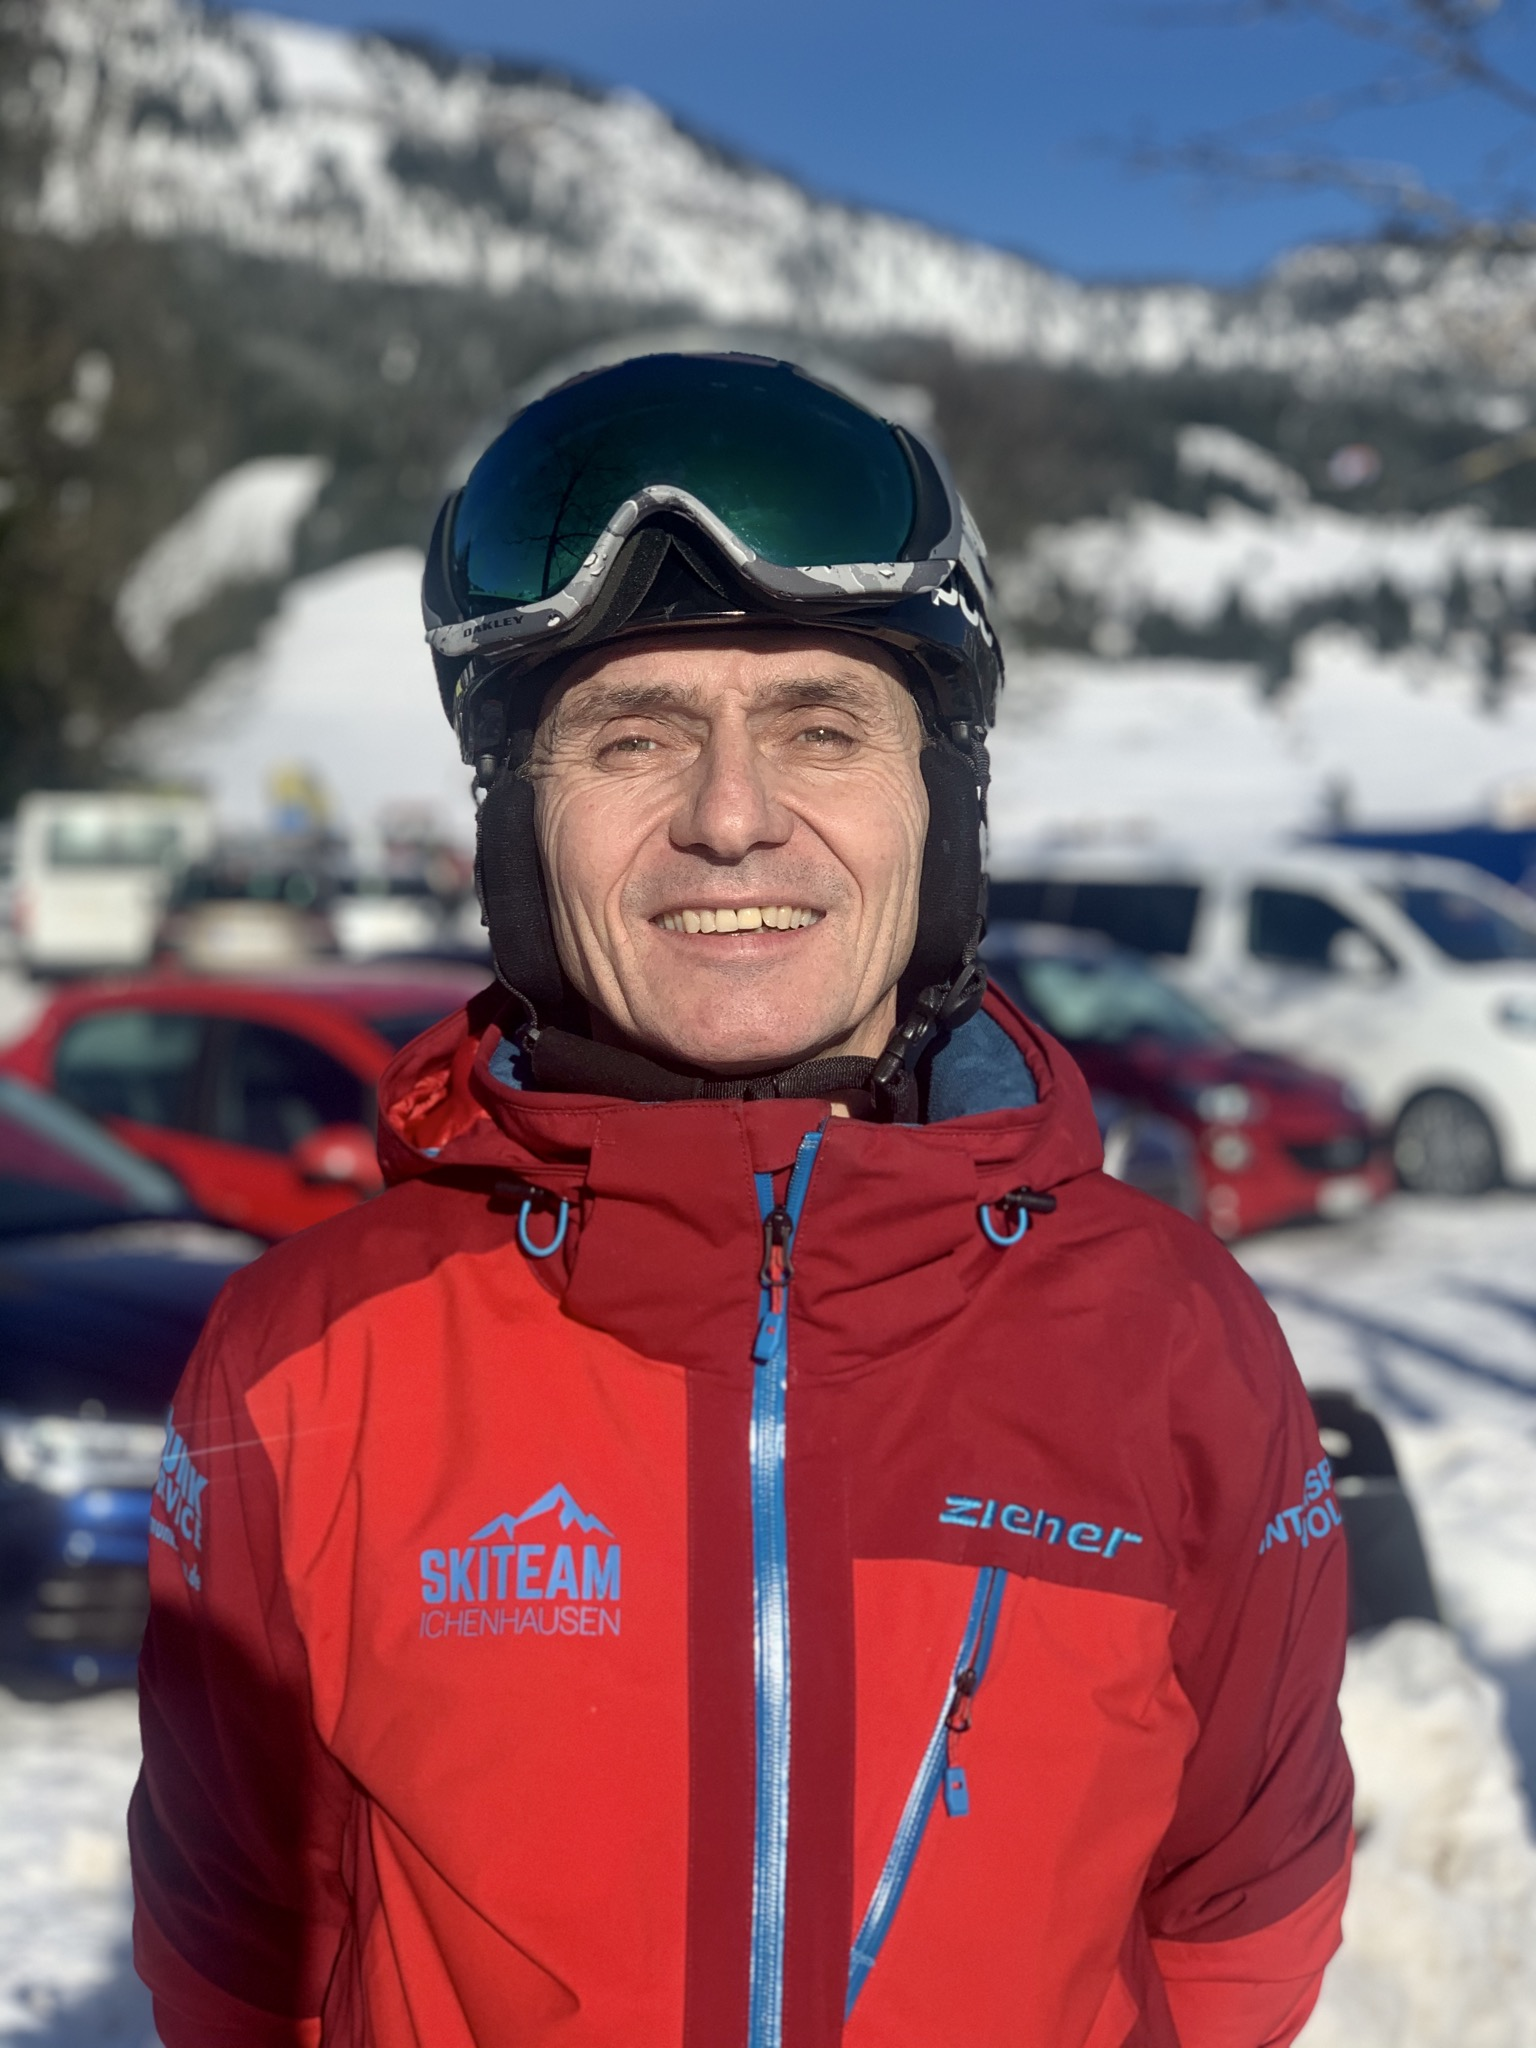 Heinz Glassenhart